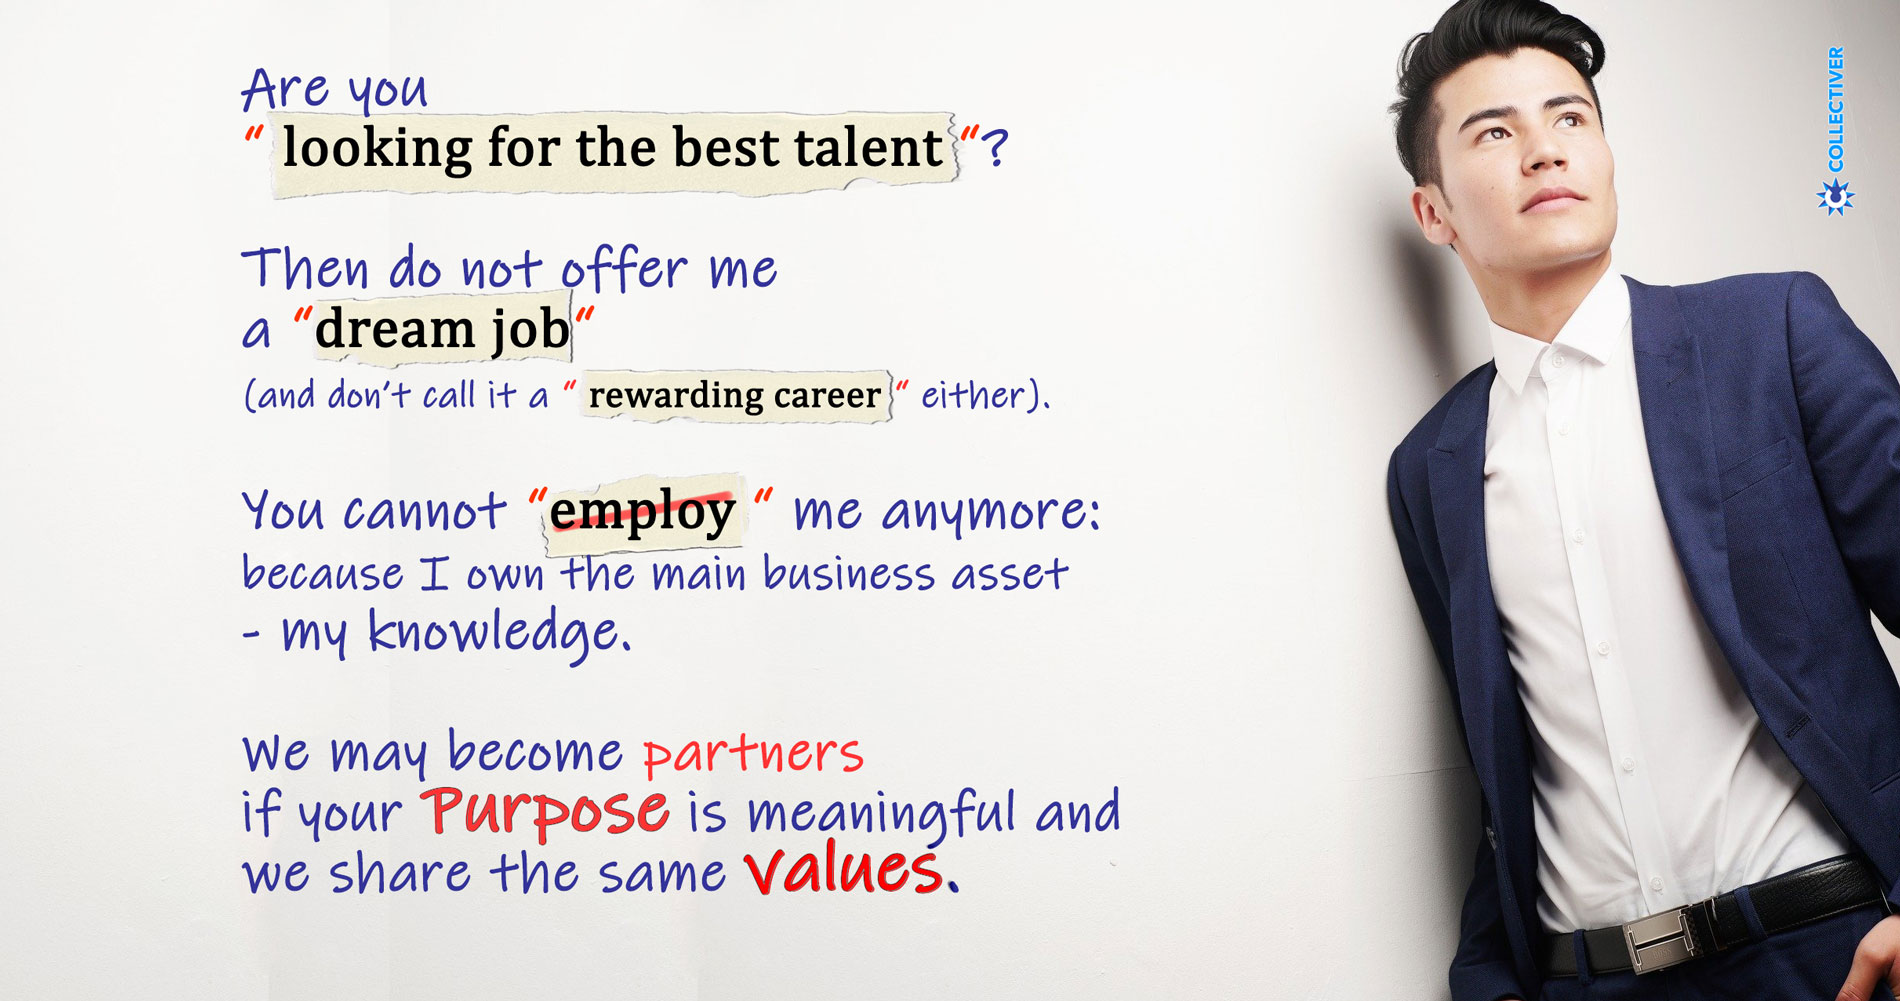 Job Search 2021